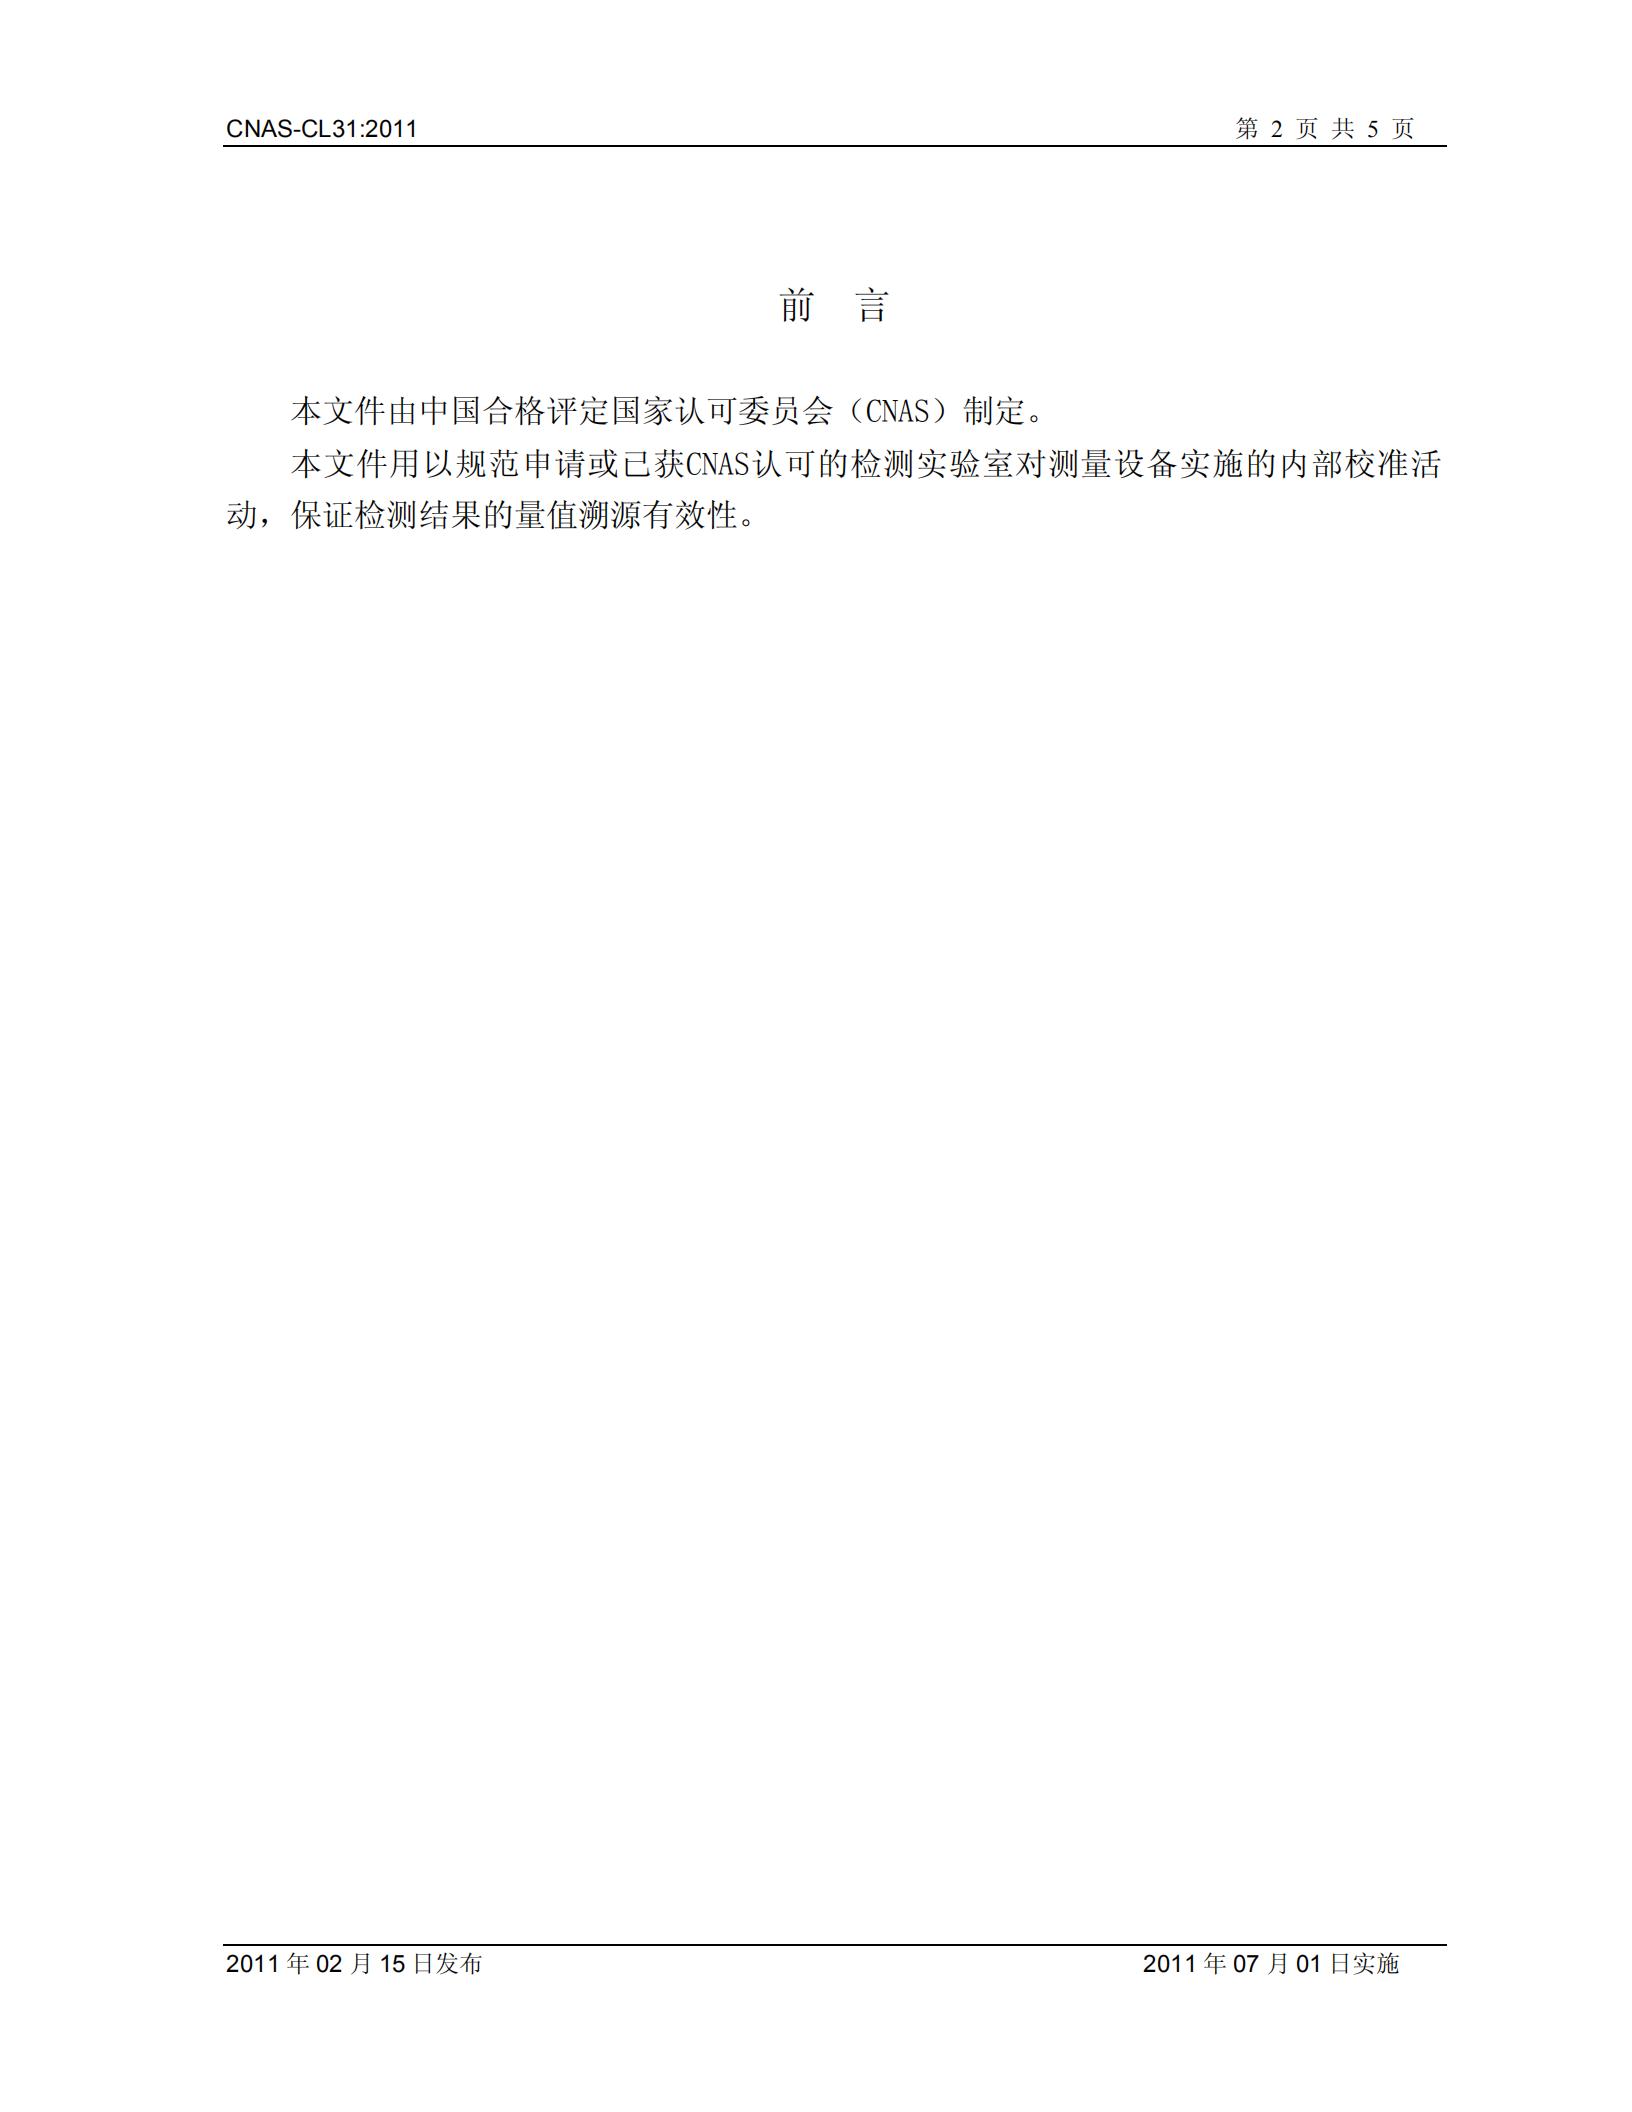 CNAS-CL31内部校准要求_01.png